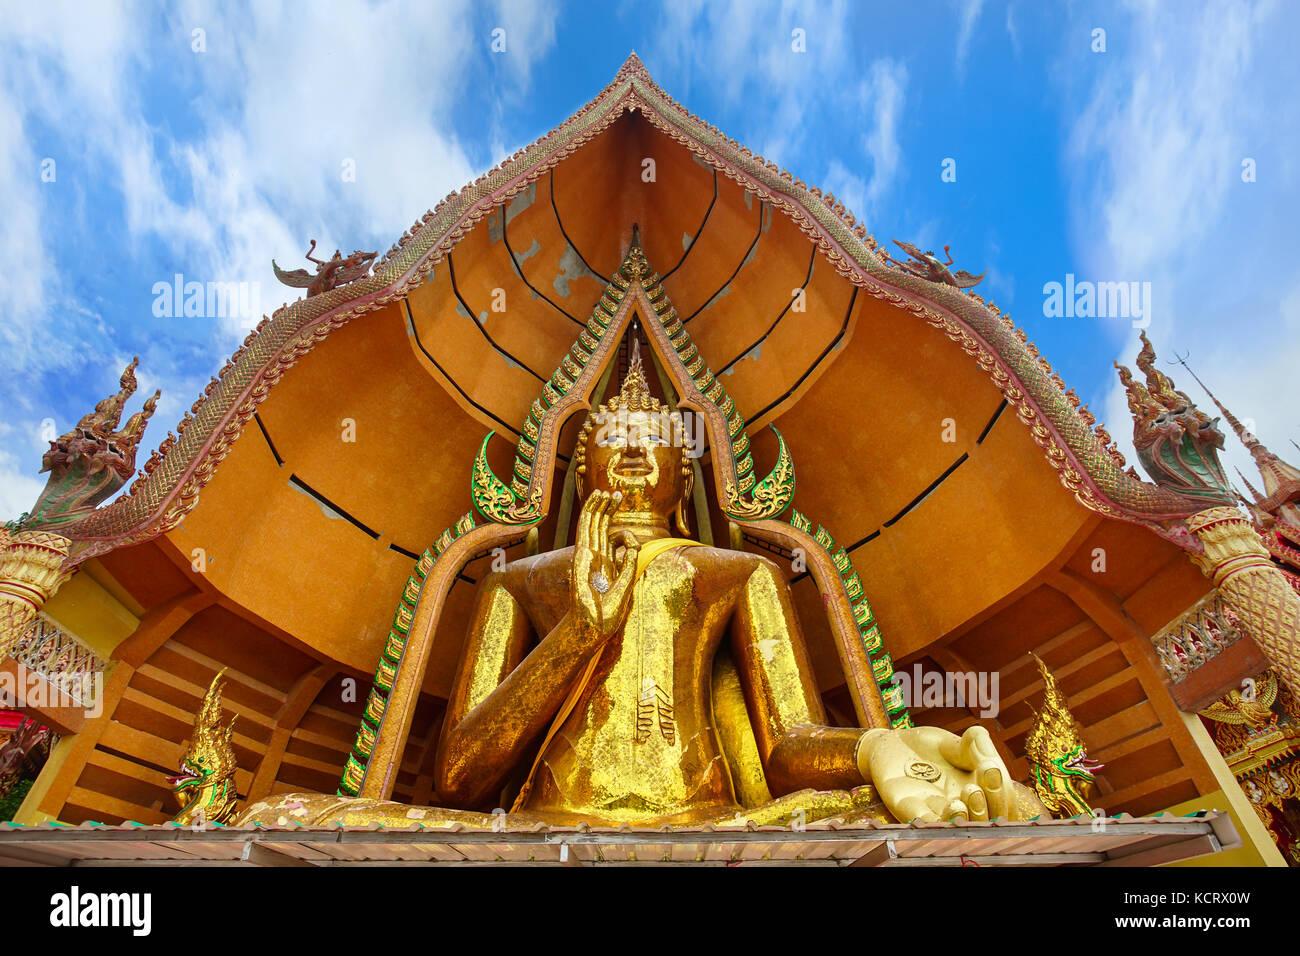 The great gorgeous Bhudda in Wat Tham Sua Kanchanaburi, Thailand - Stock Image